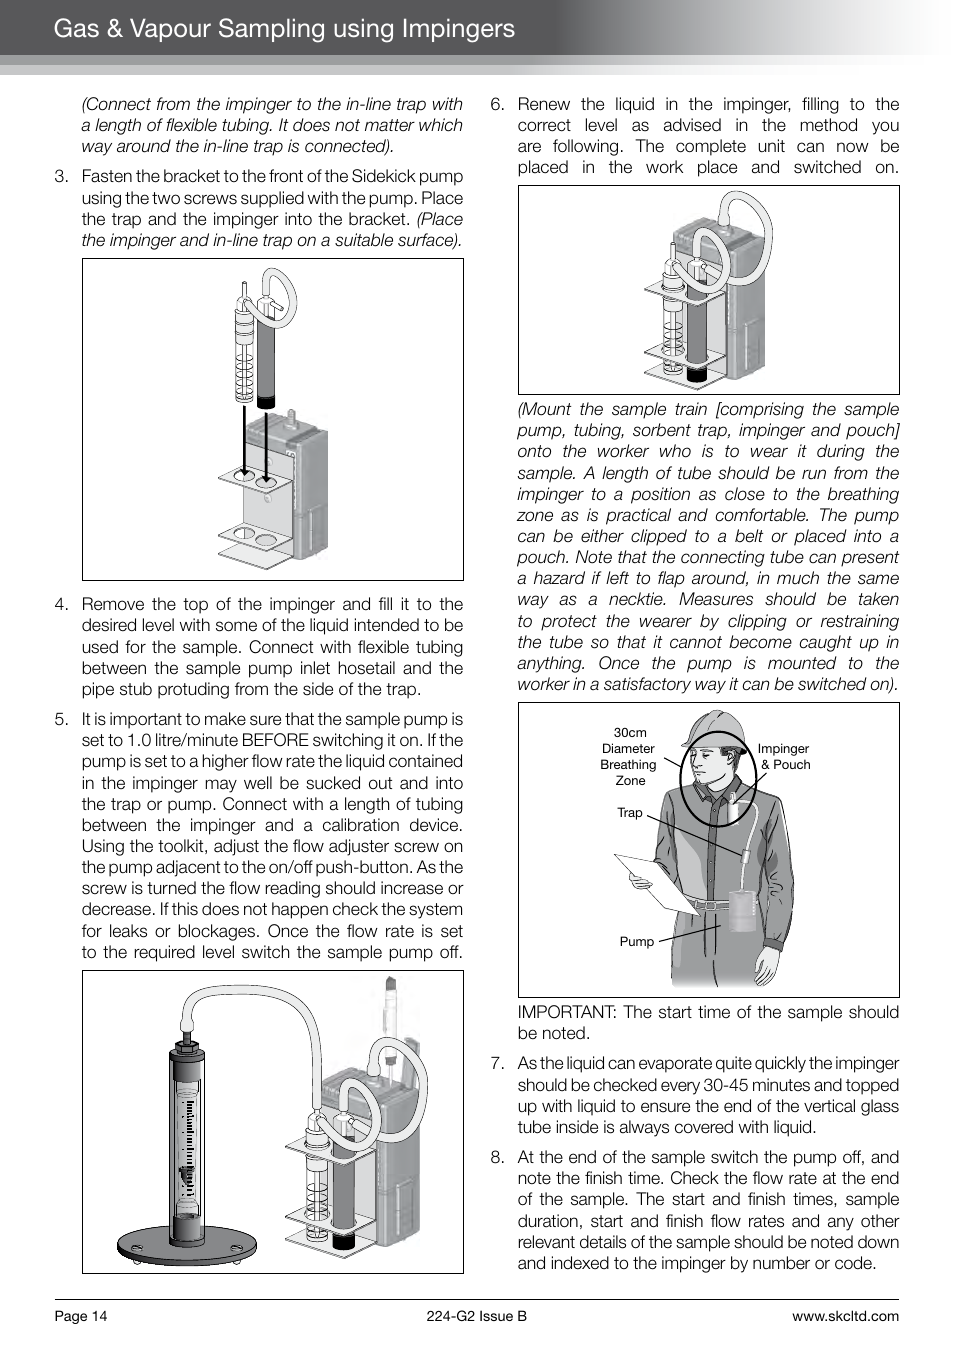 gas vapour sampling using impingers skc limited sidekick pump rh manualsdir com Pink Sidekick Sidekick Slide